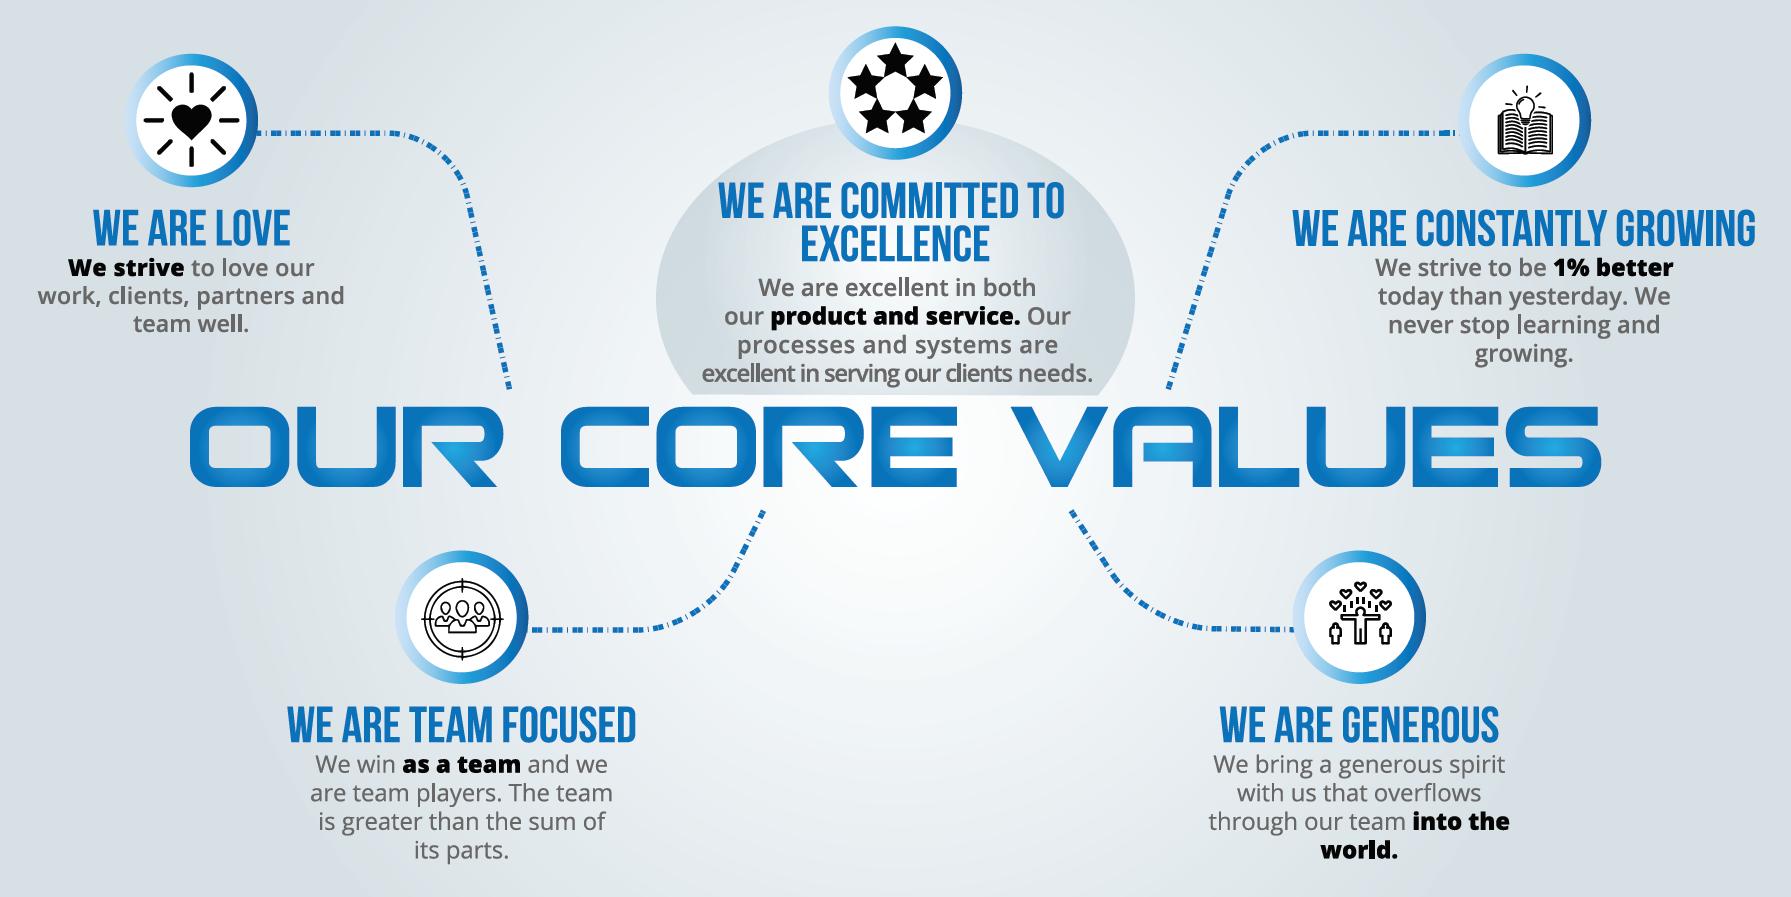 Brand Elevate's Core Values